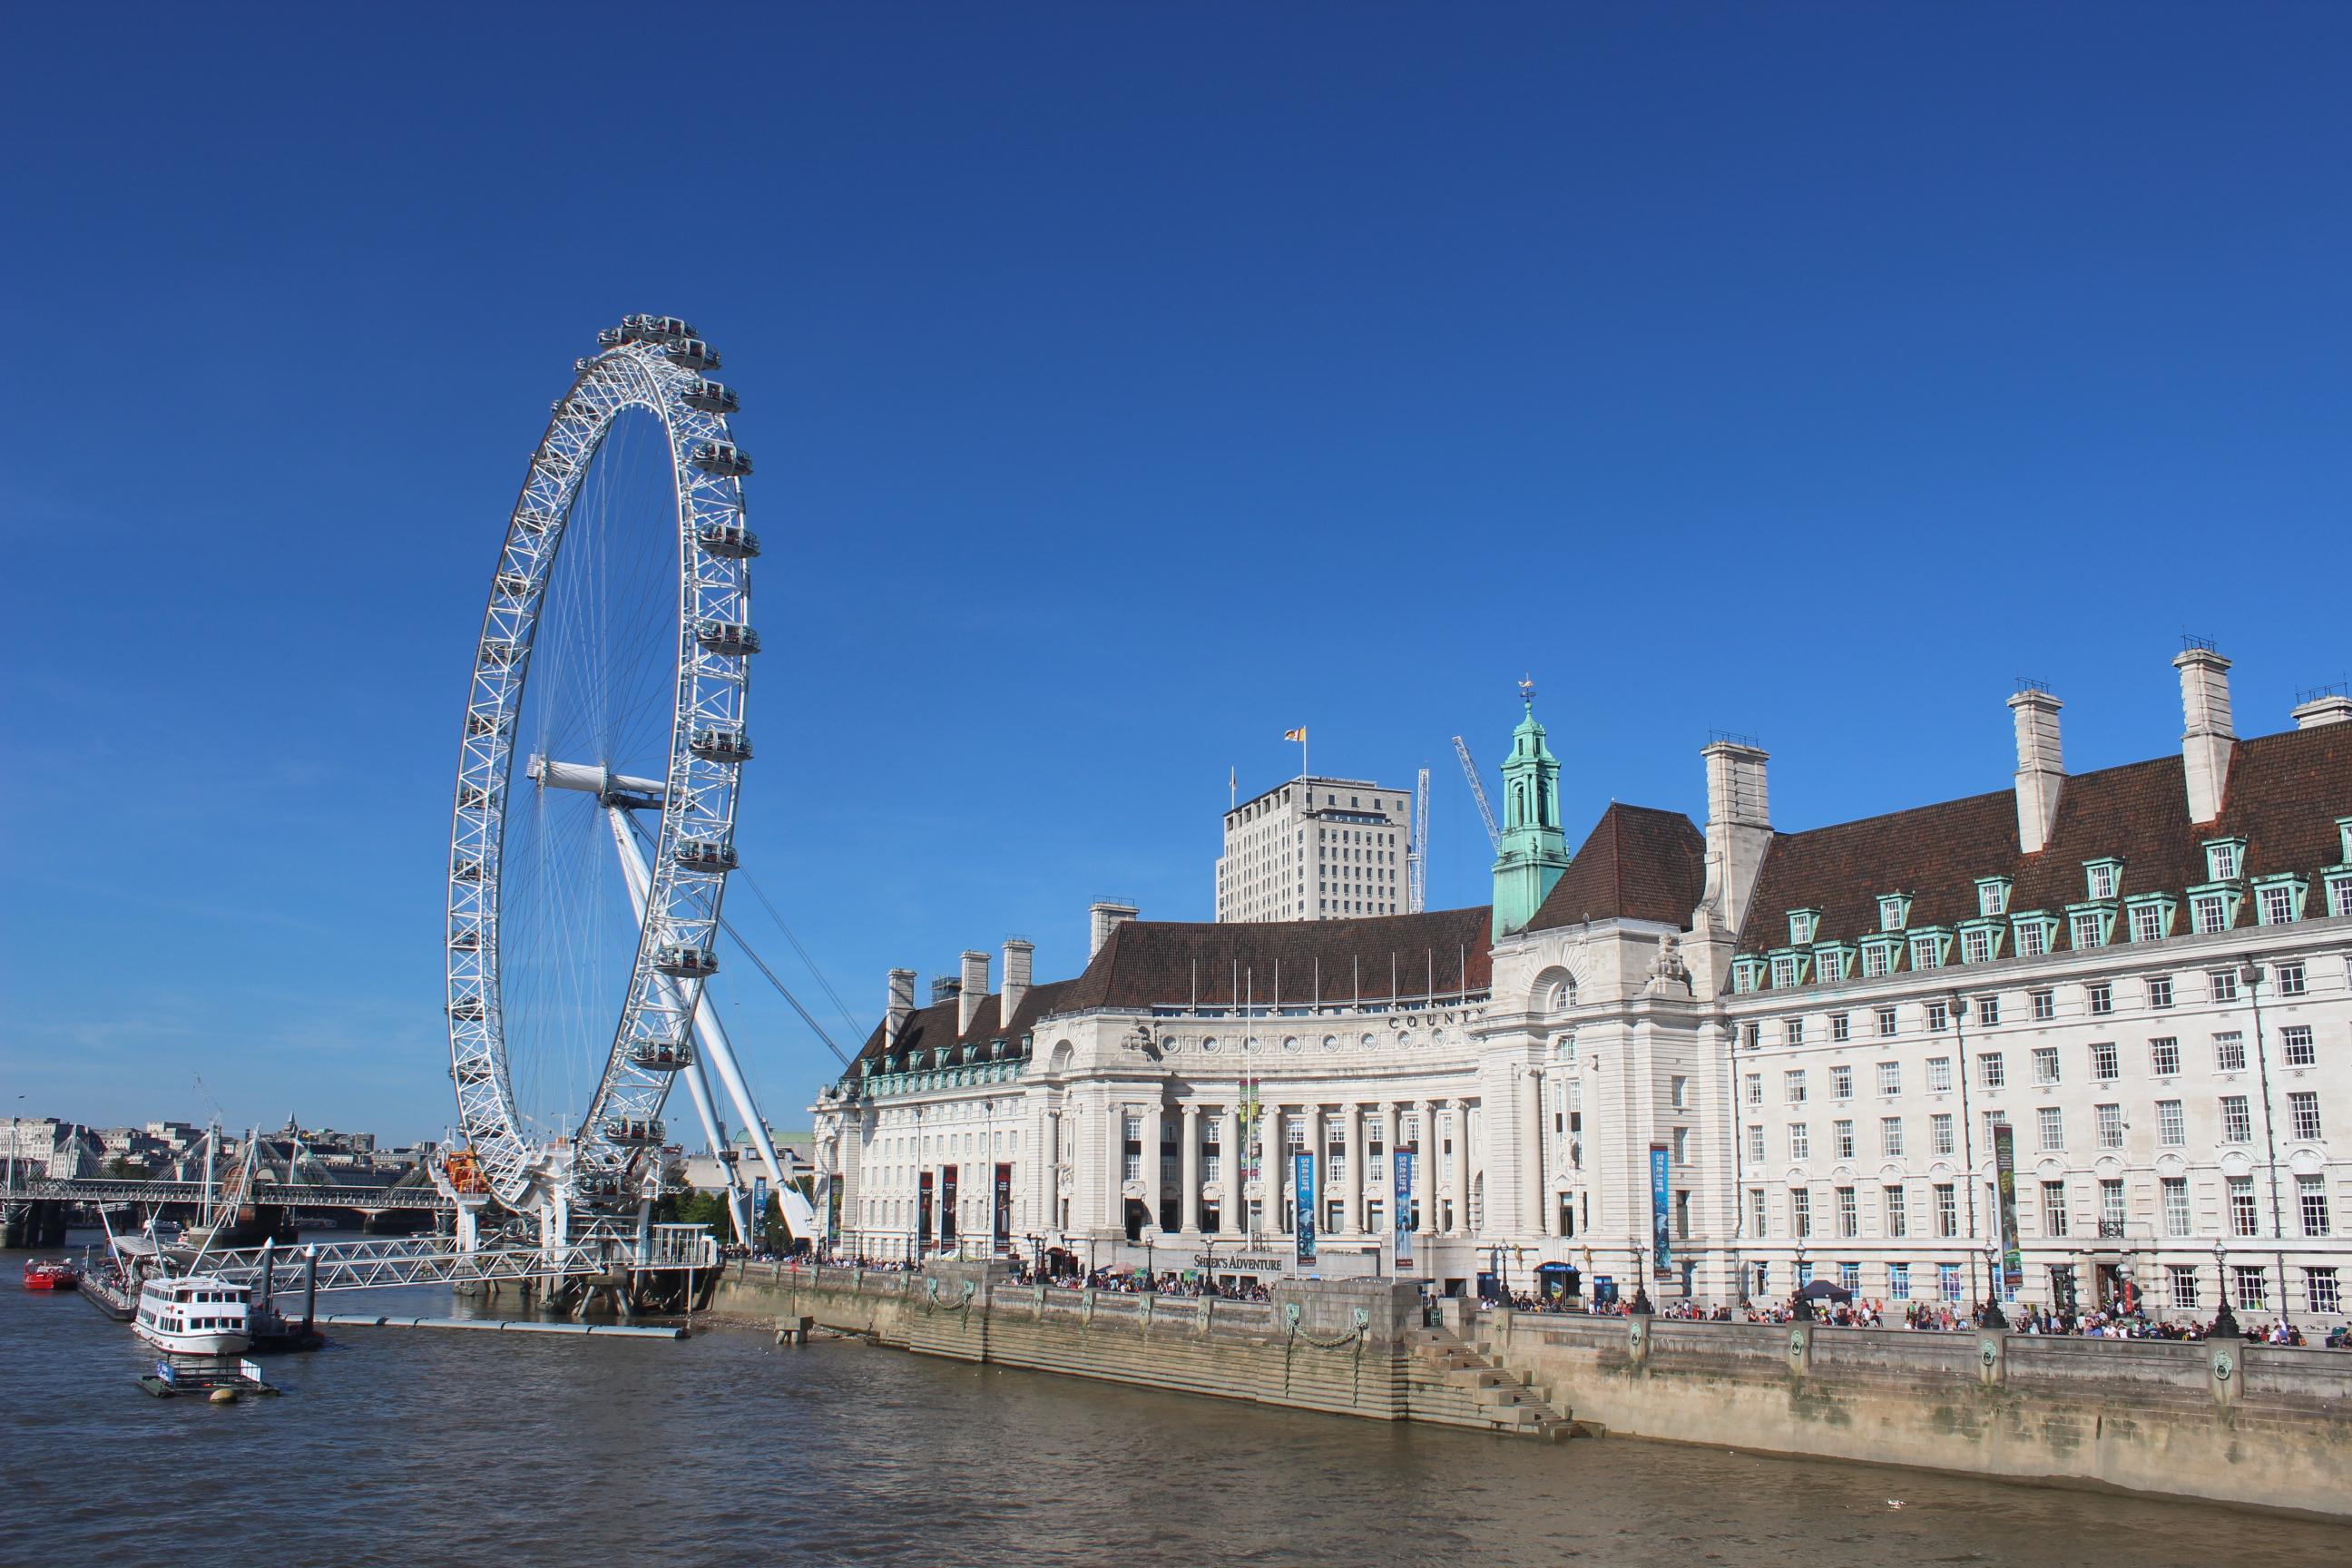 Ibis Hotel Jobs London